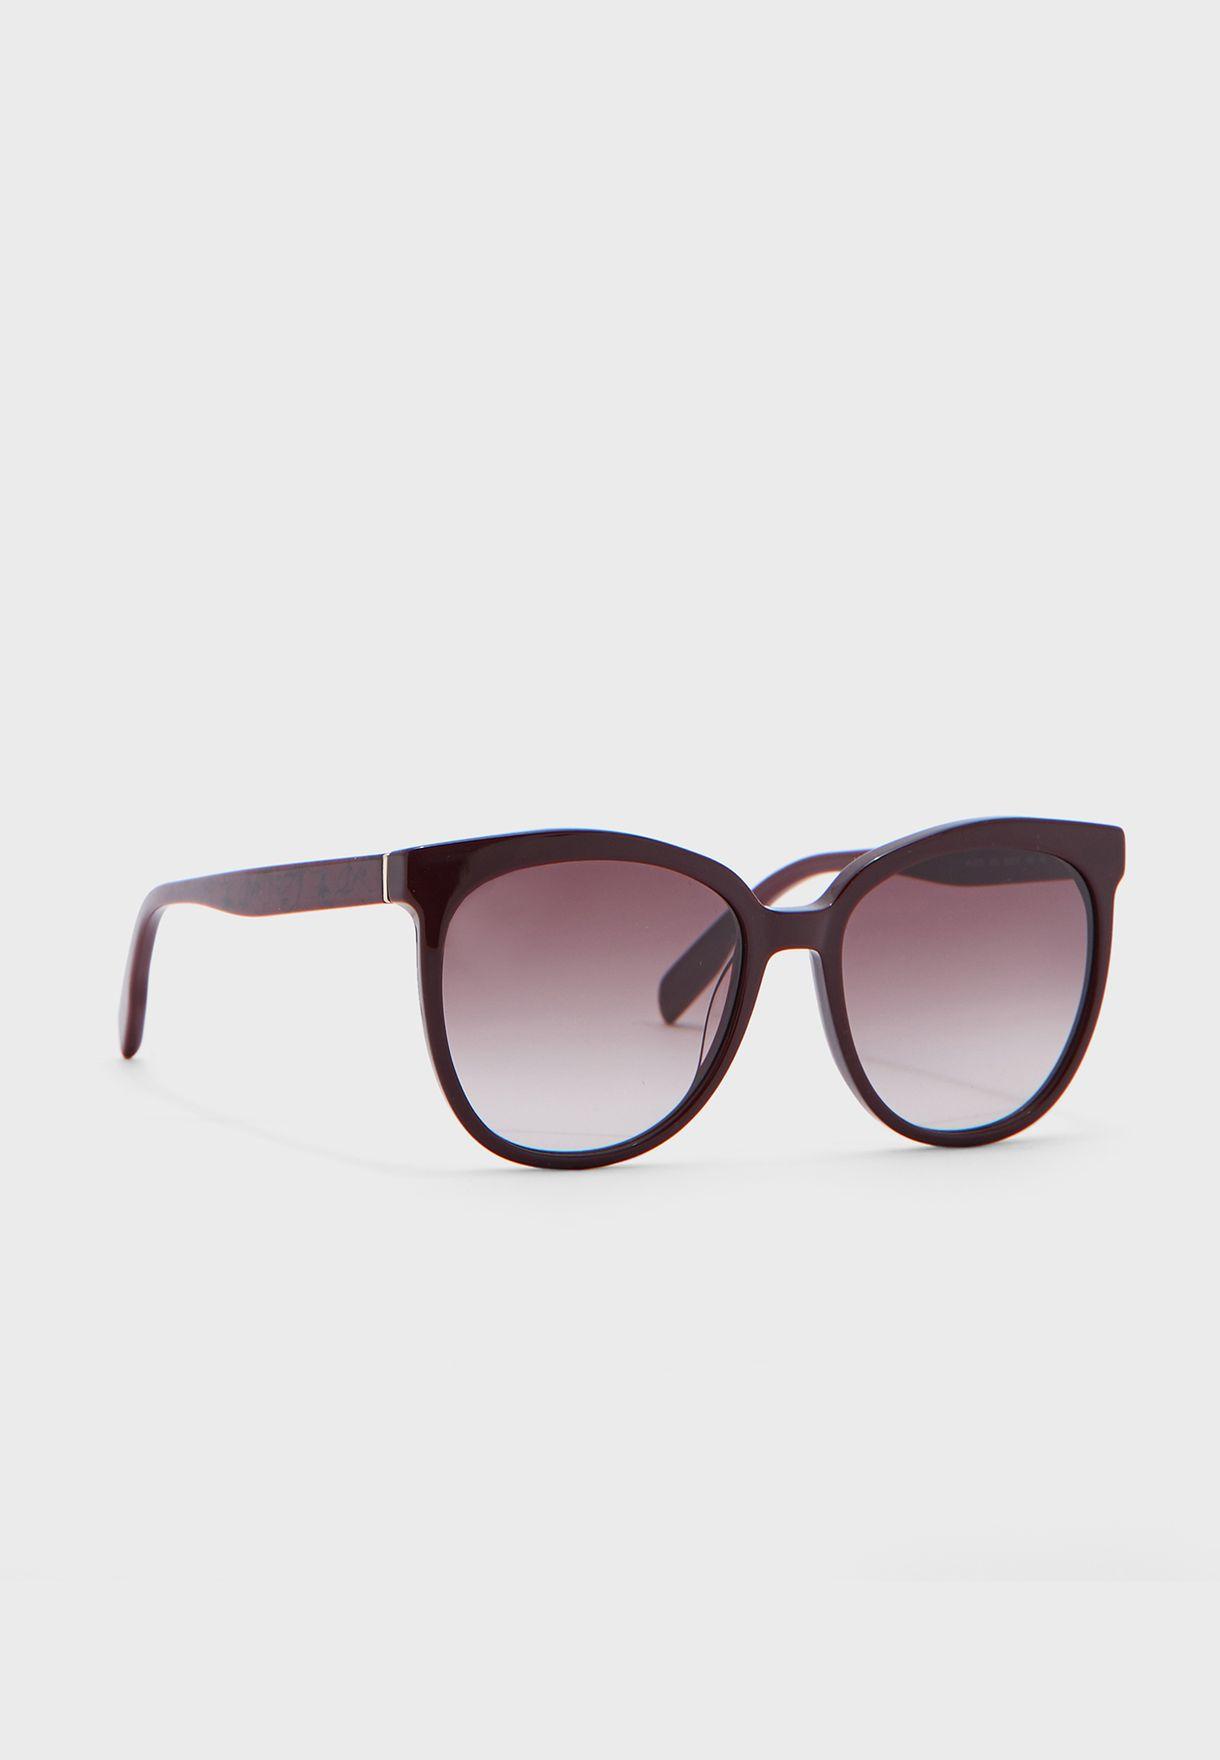 Kl937S Square Sunglasses